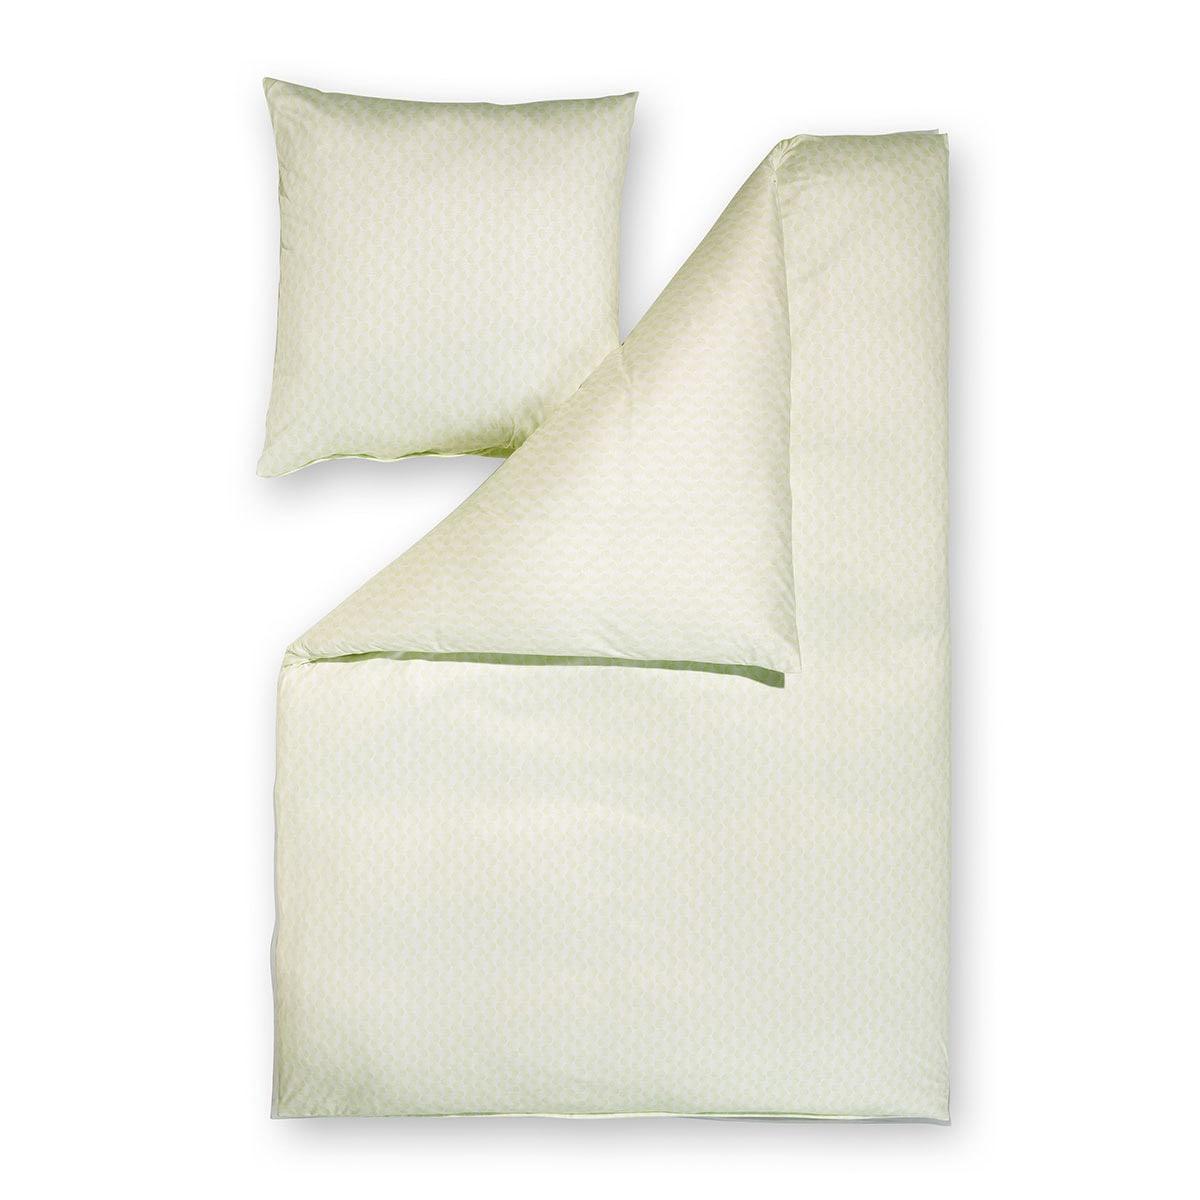 estella mako interlock jersey bettw sche dilan apfel g nstig online kaufen bei bettwaren shop. Black Bedroom Furniture Sets. Home Design Ideas